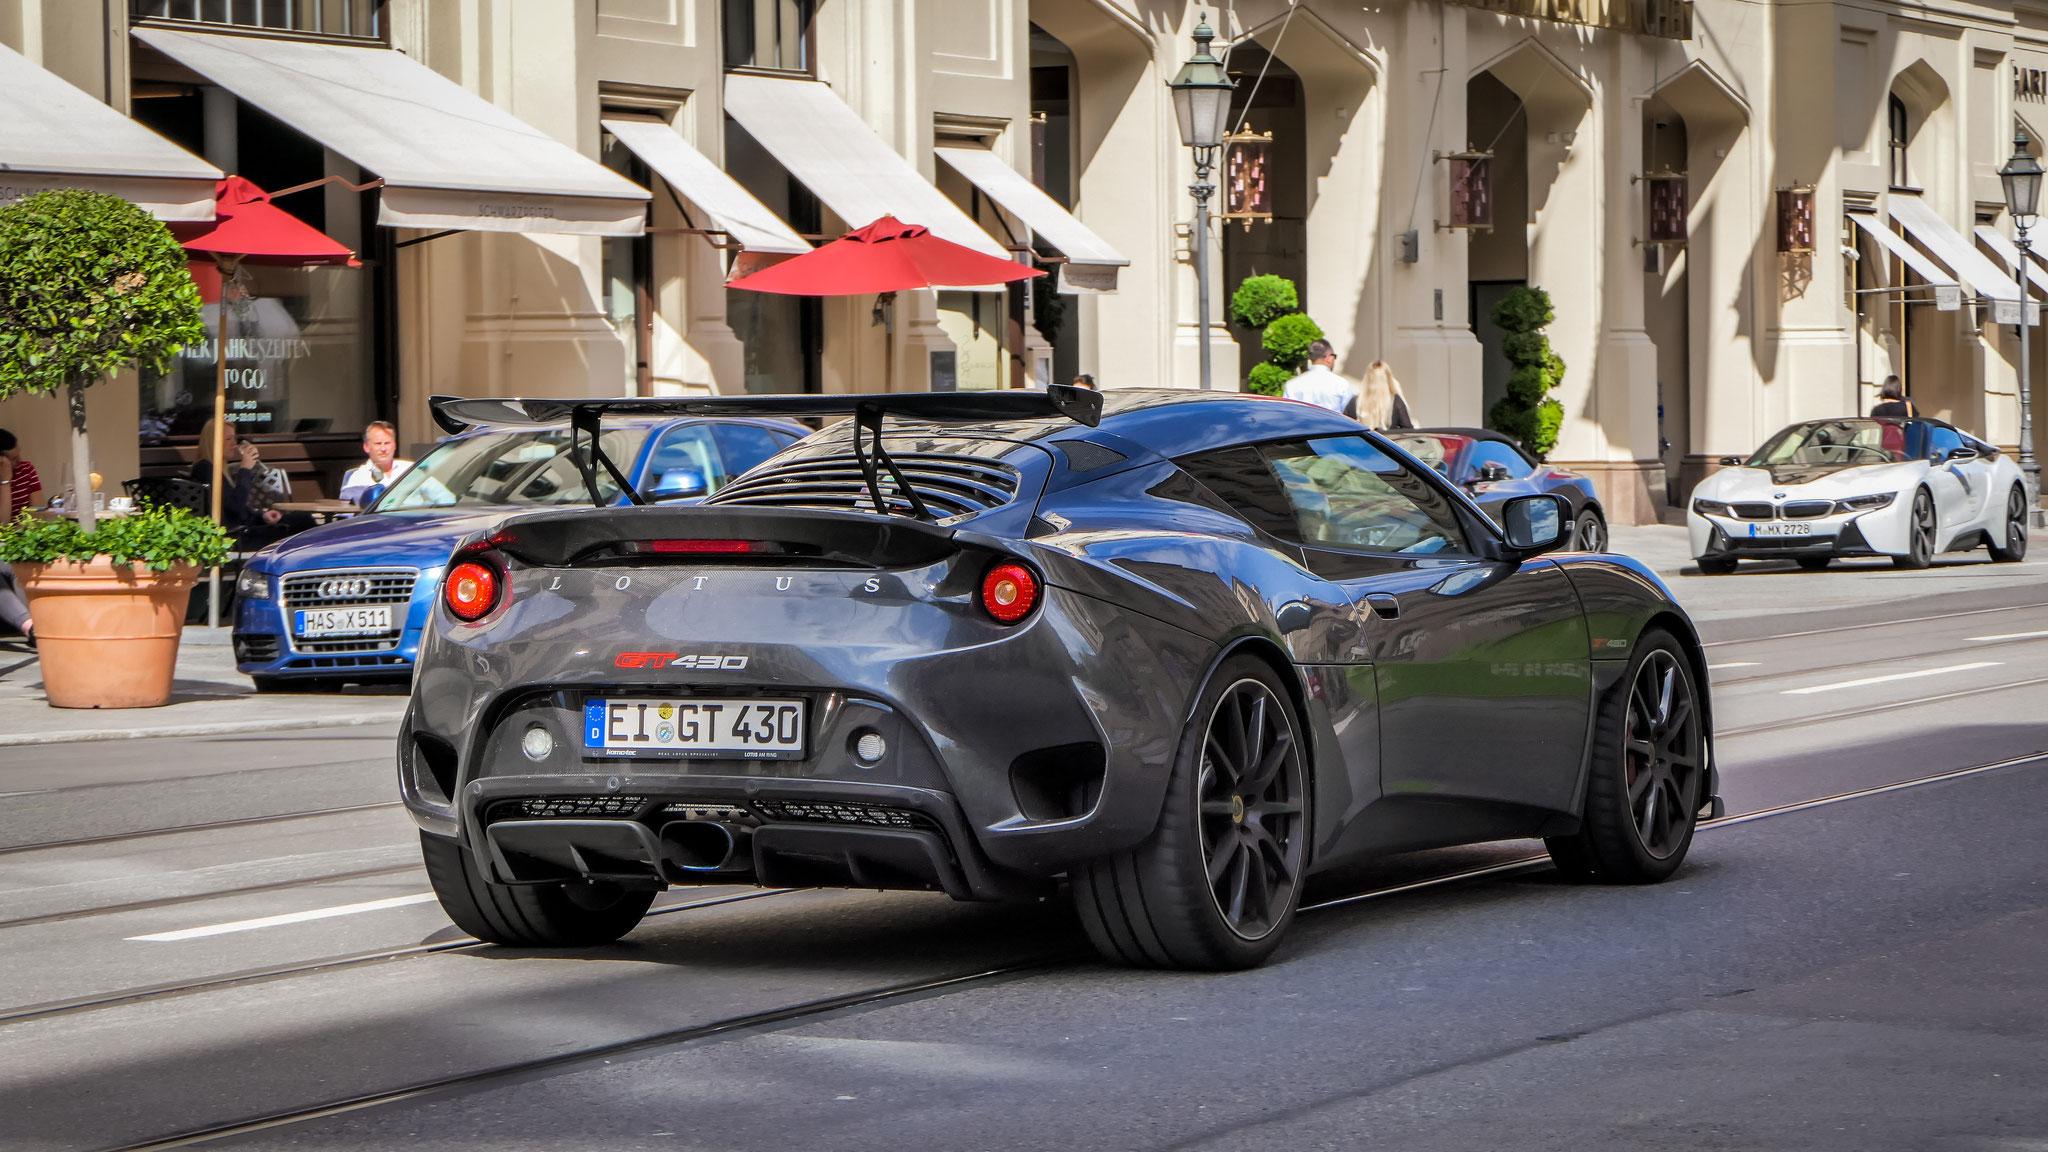 Lotus Evora GT 430 - EI-GT-430